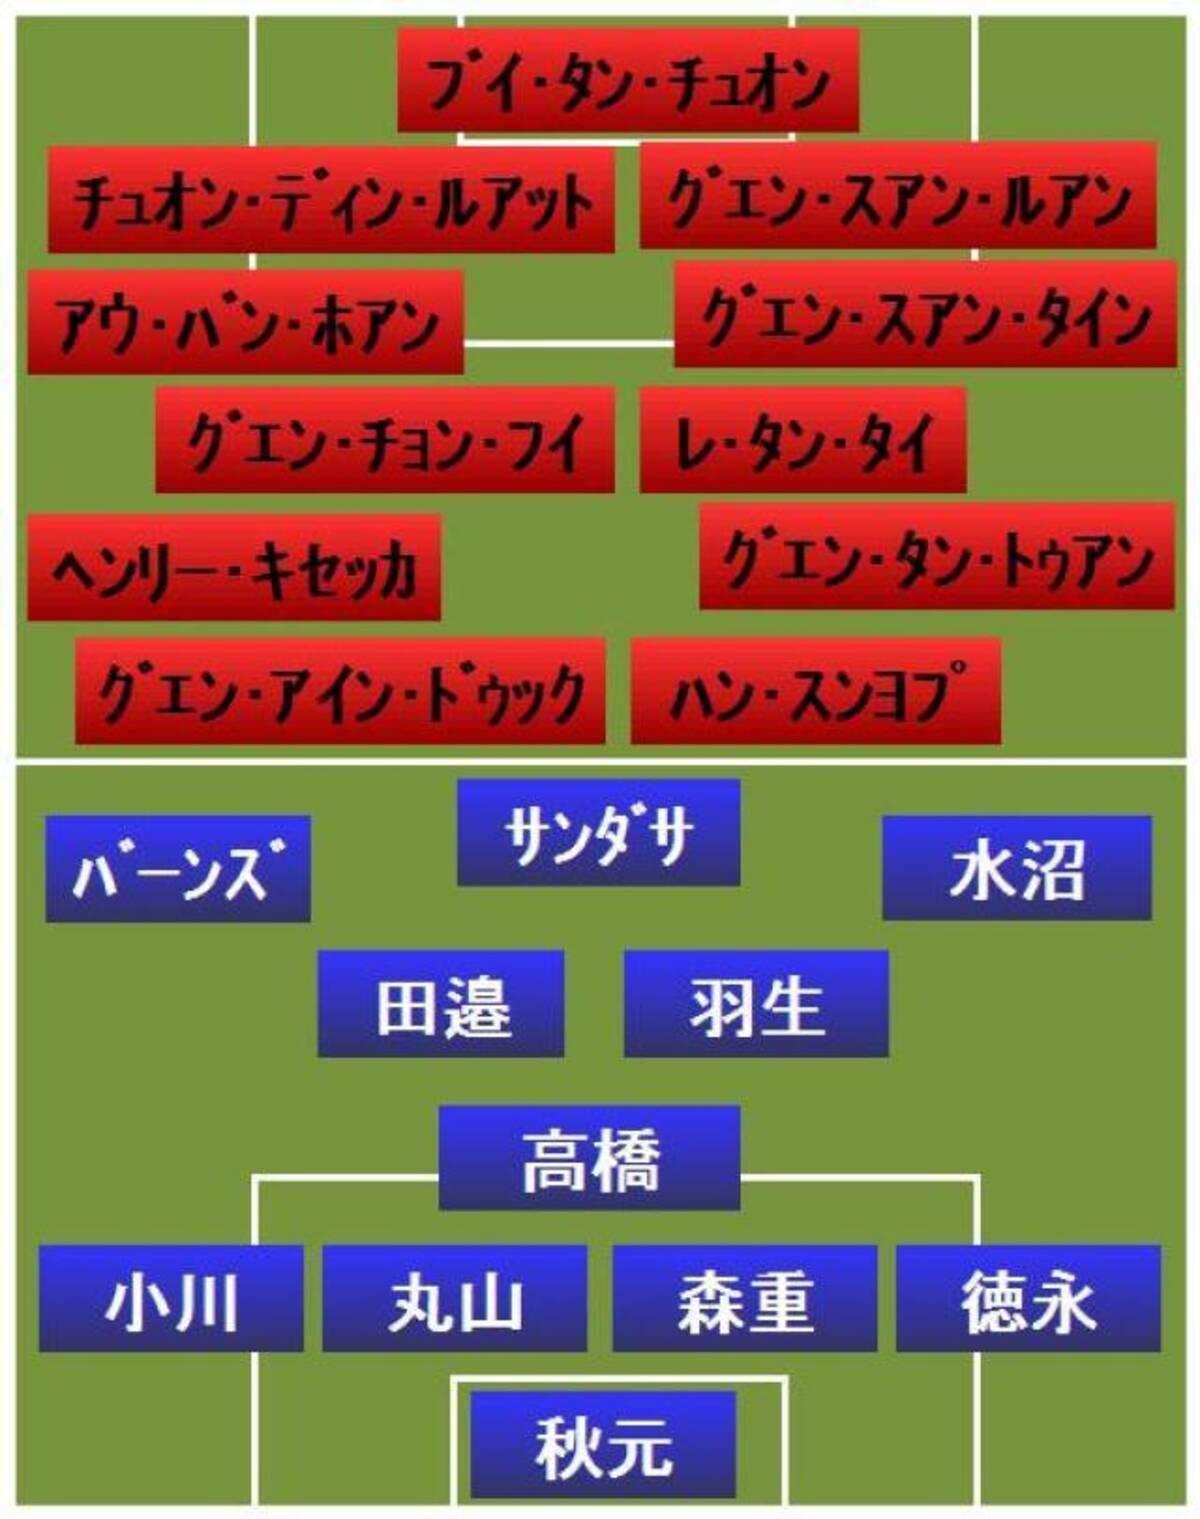 FC東京vsビン・ズオン スタメン発表 (2016年3月1日) - エキサイトニュース